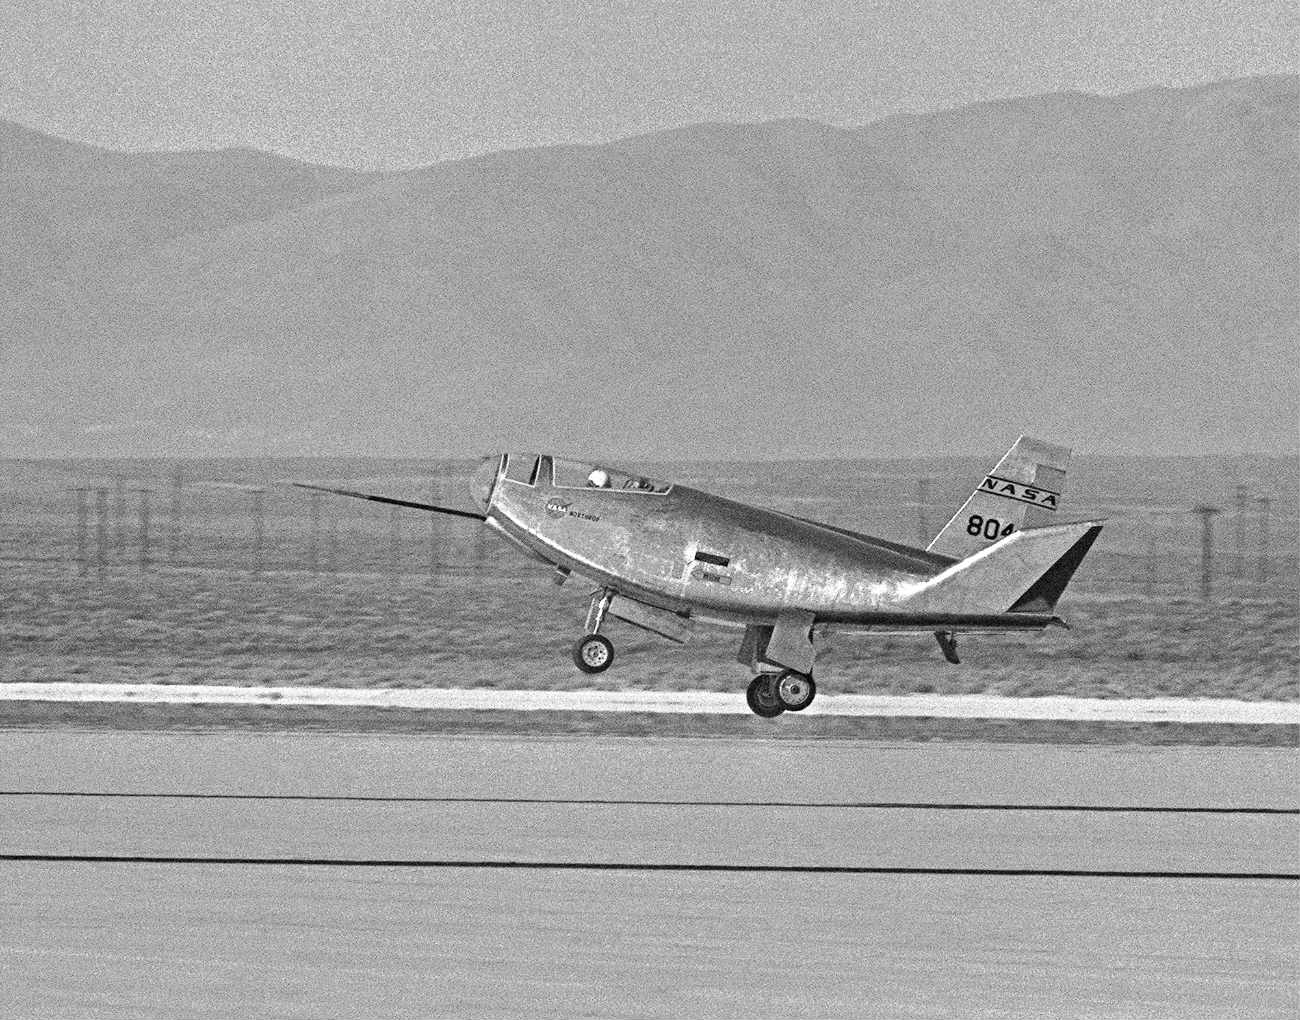 HL-10 Lifting Body landing